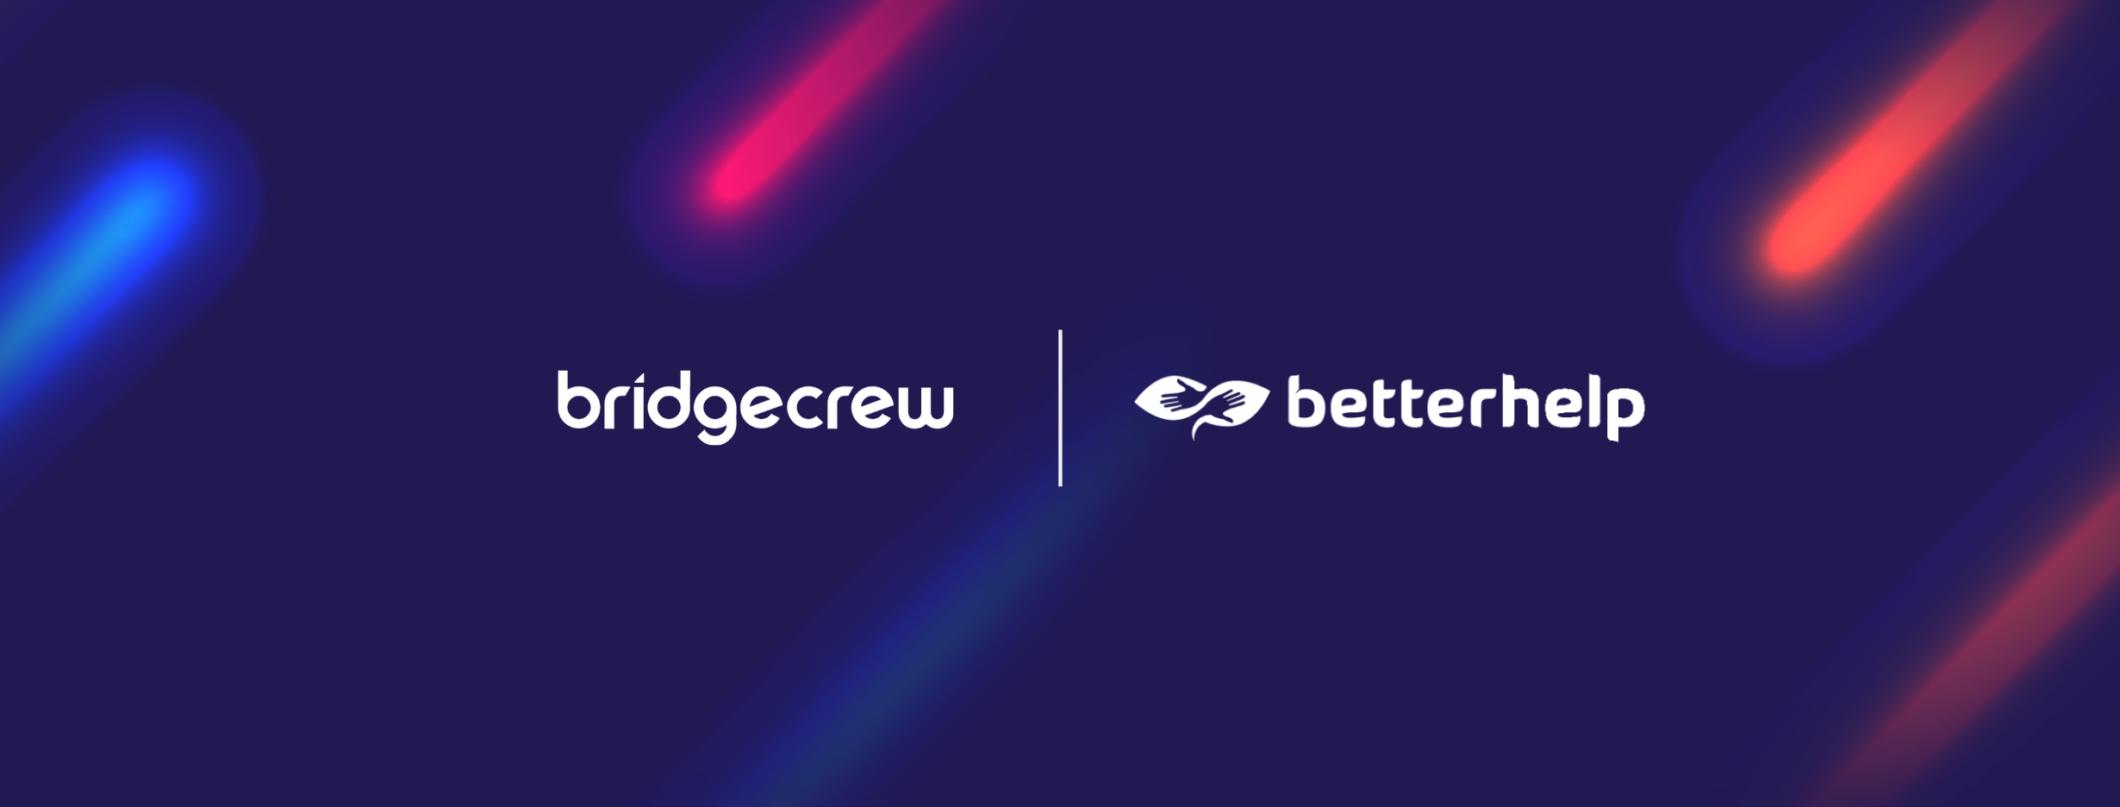 Bridgecrew and Betterhelp logo